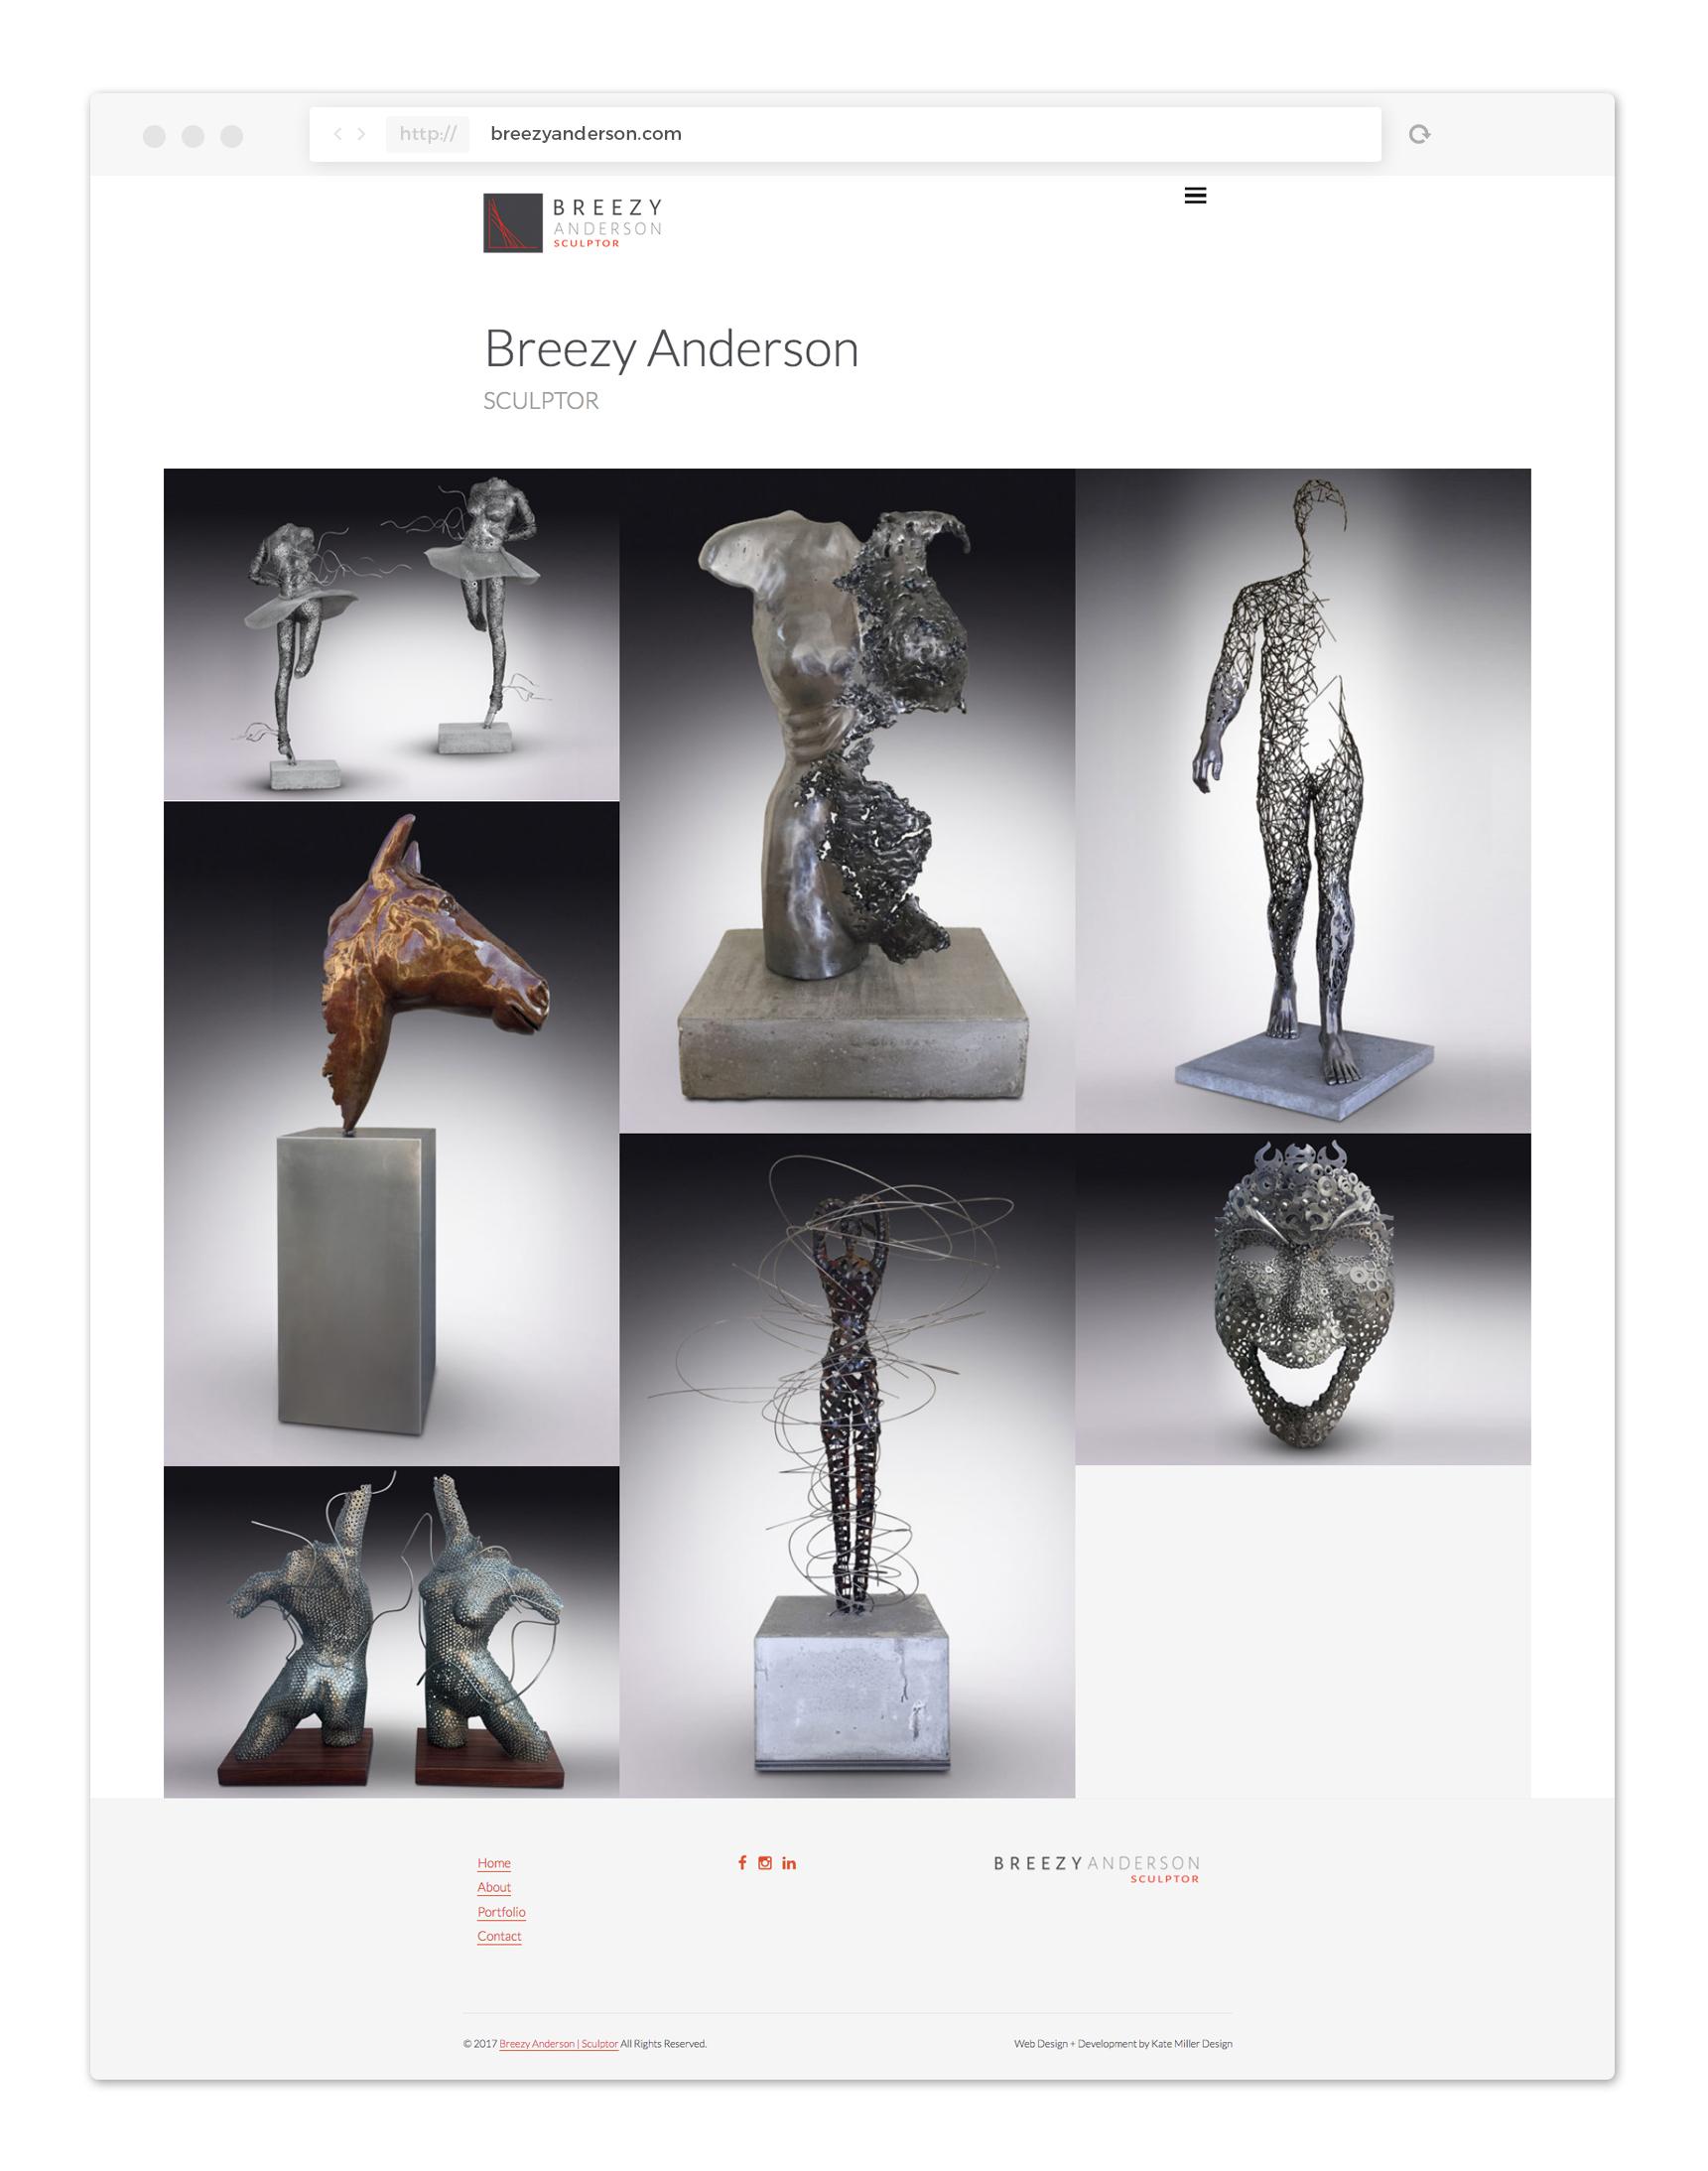 Breezy Anderson - Sculptor website Home